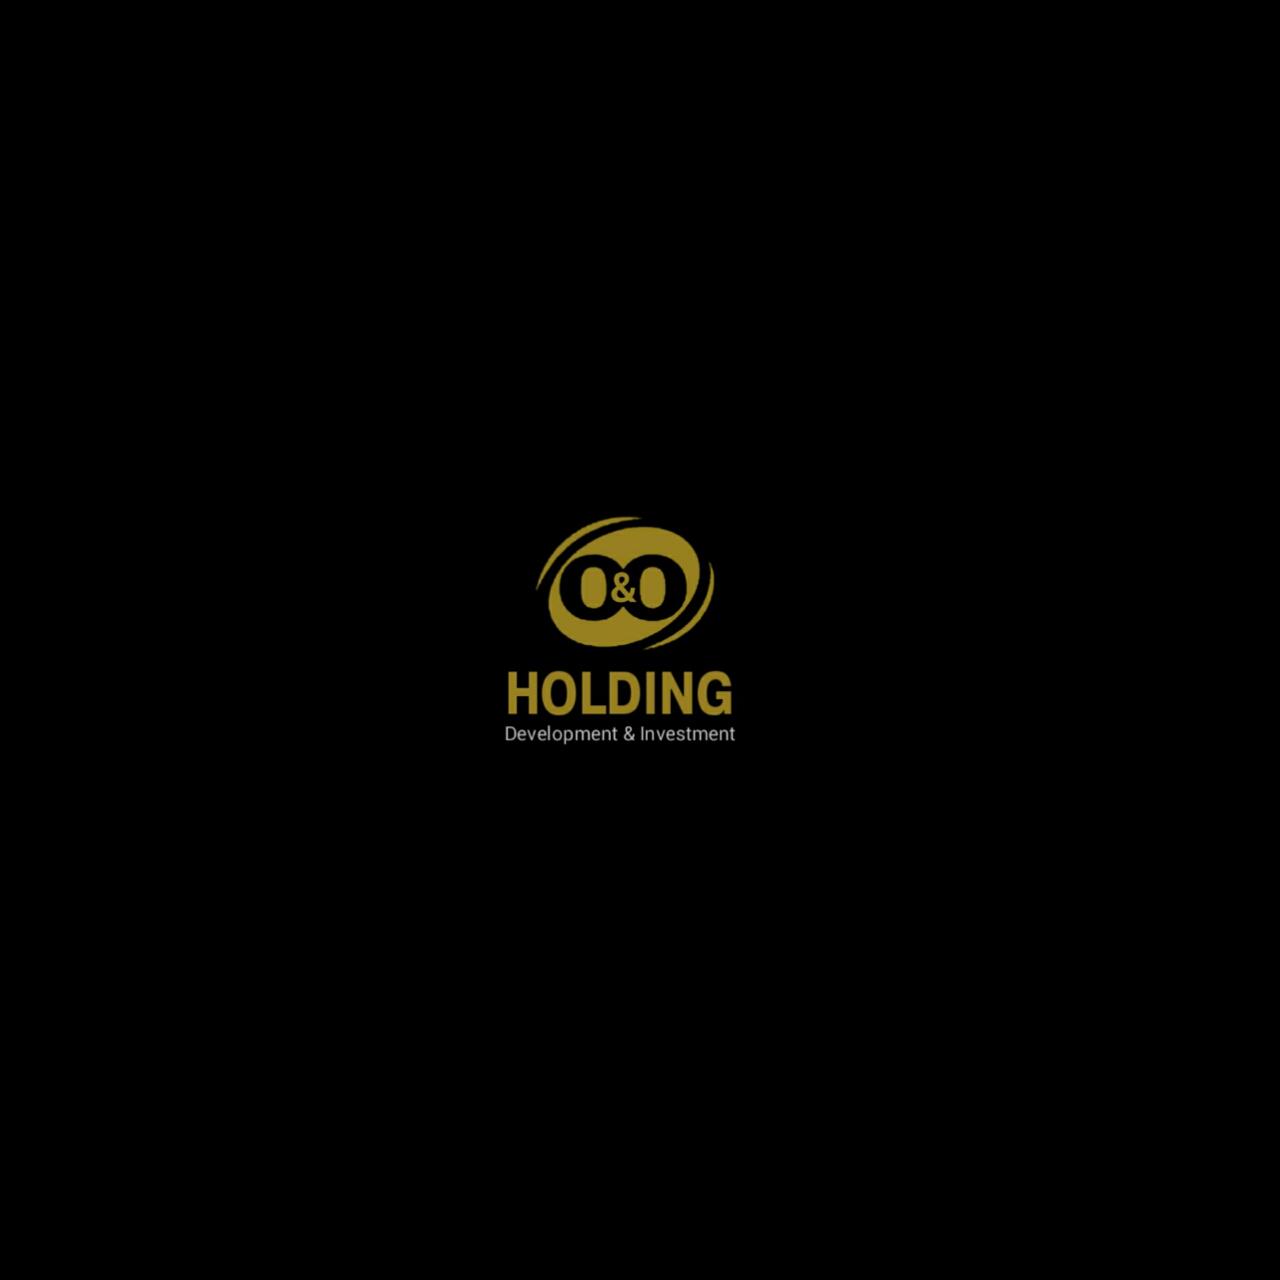 "Разработка Логотипа +  Фирменного знака для компании ""O & O HOLDING"" фото f_4035c7bd90cb9a42.jpg"